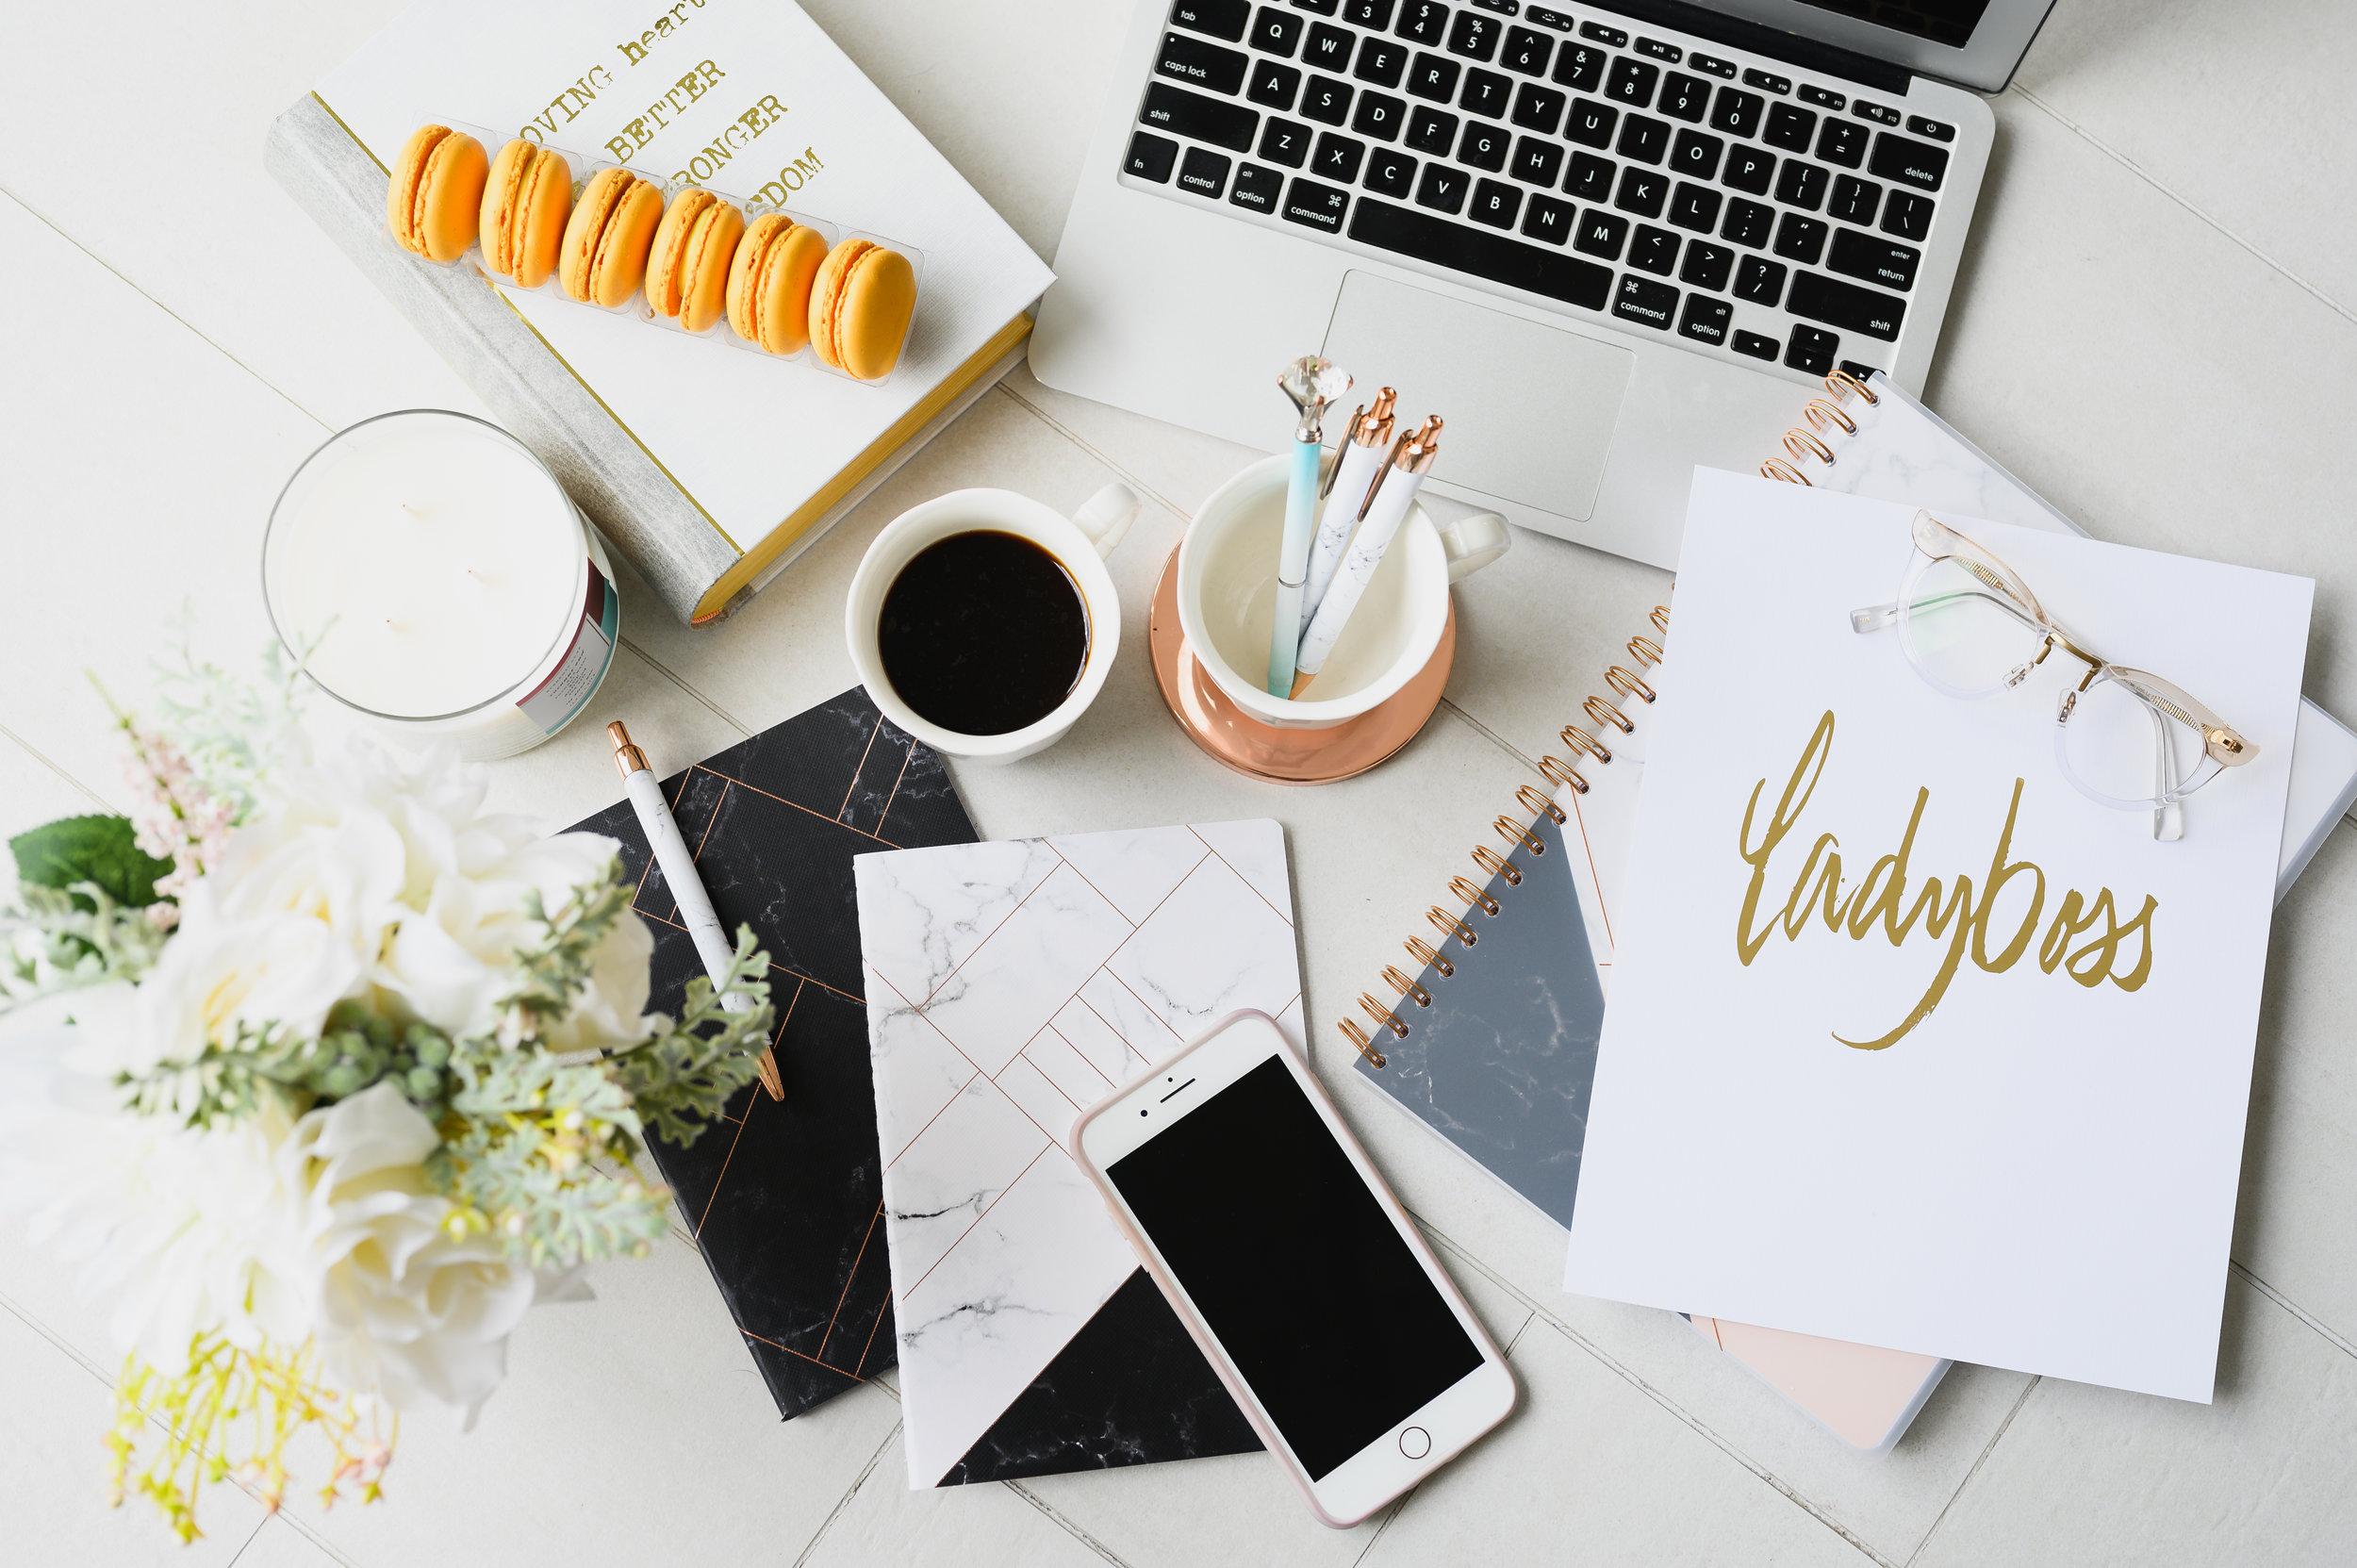 Andrea Henry Business LAW - PRINT - 2019 - Branding Photography - Mike Black PhotoWorks dot com-1.jpg